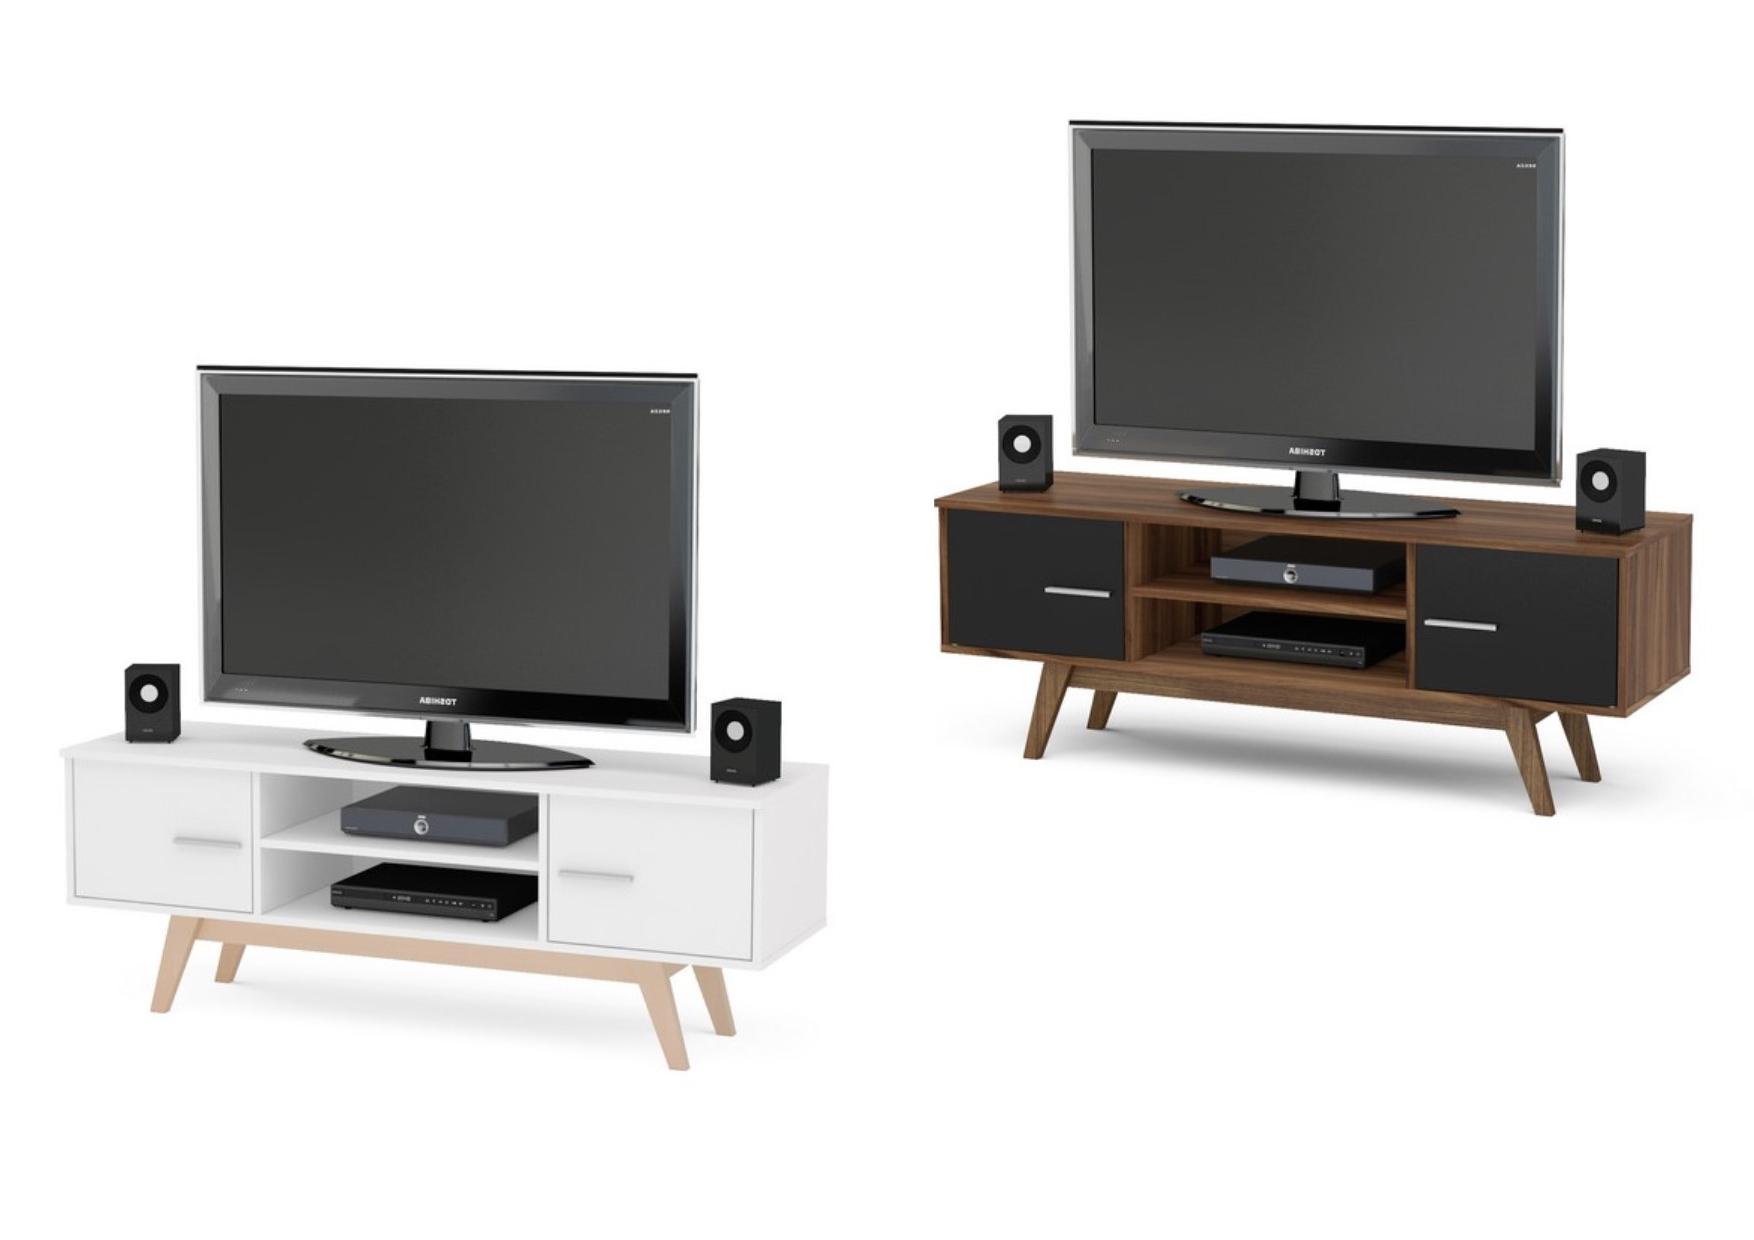 2018 Birlea Shard Gloss Tv Units – Cabinet & Shelves – Wooden Legs Regarding Tv Units Black (View 1 of 20)